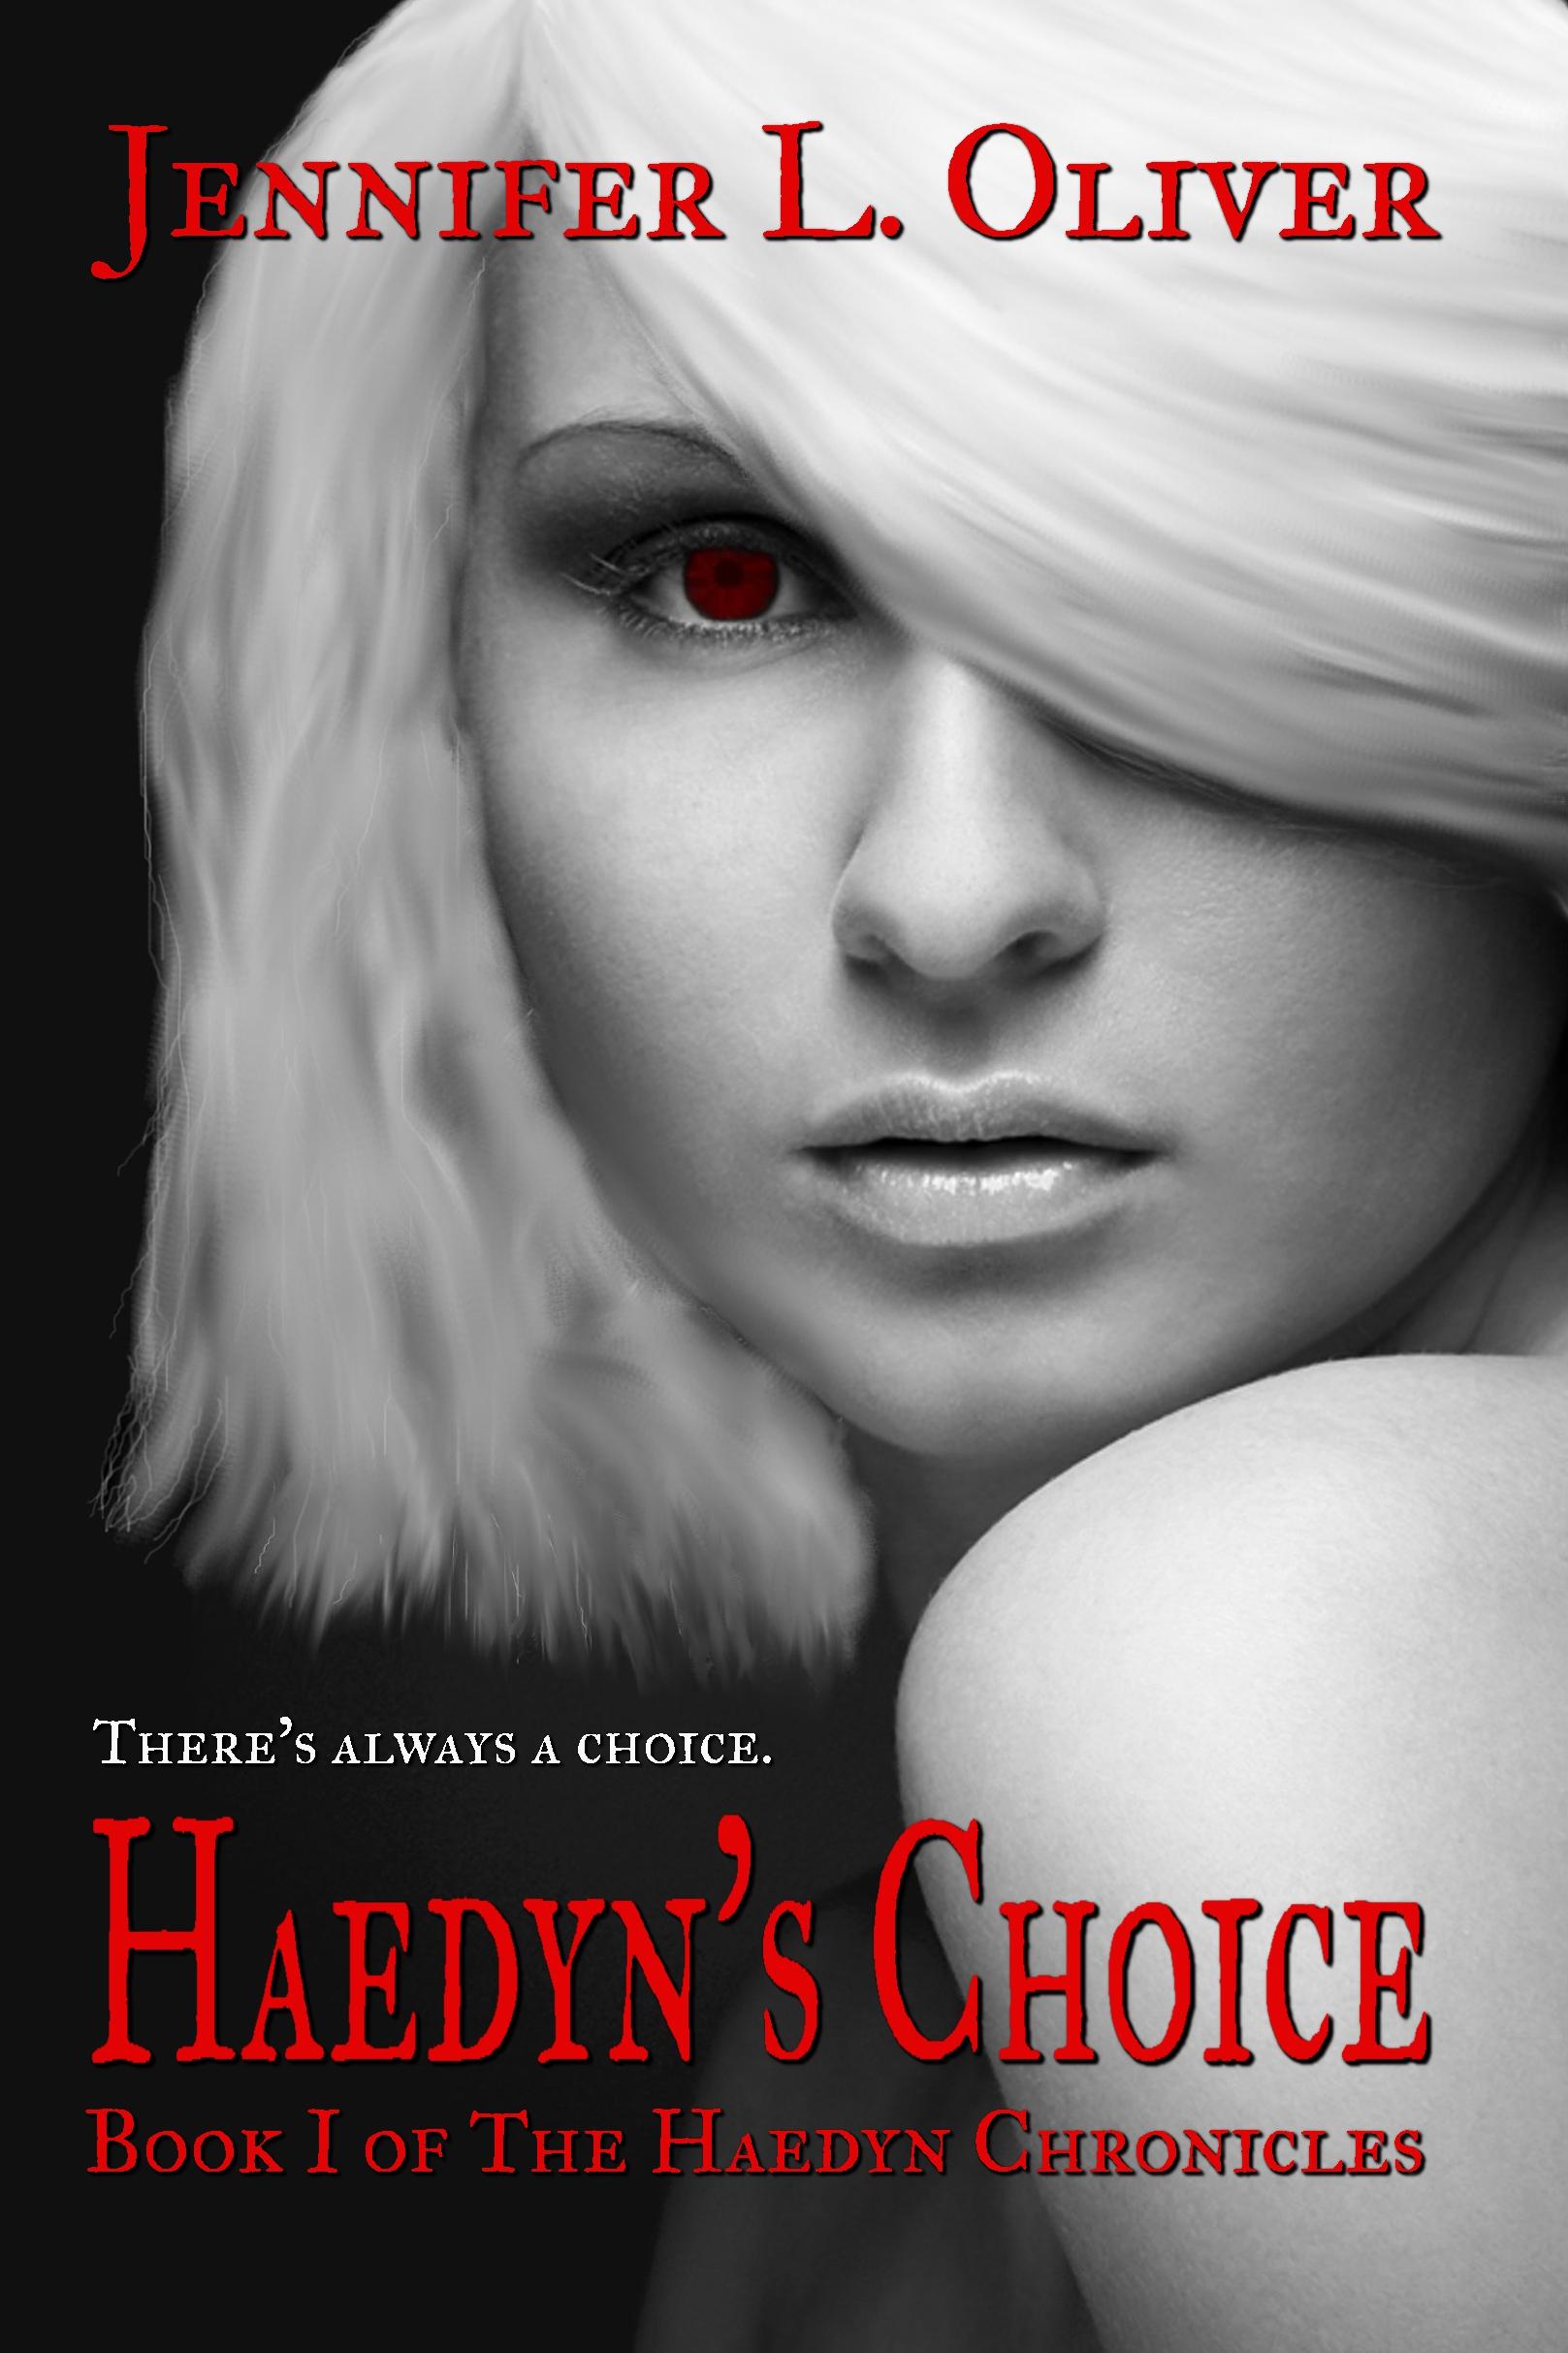 Book Review: Haedyn's Choice